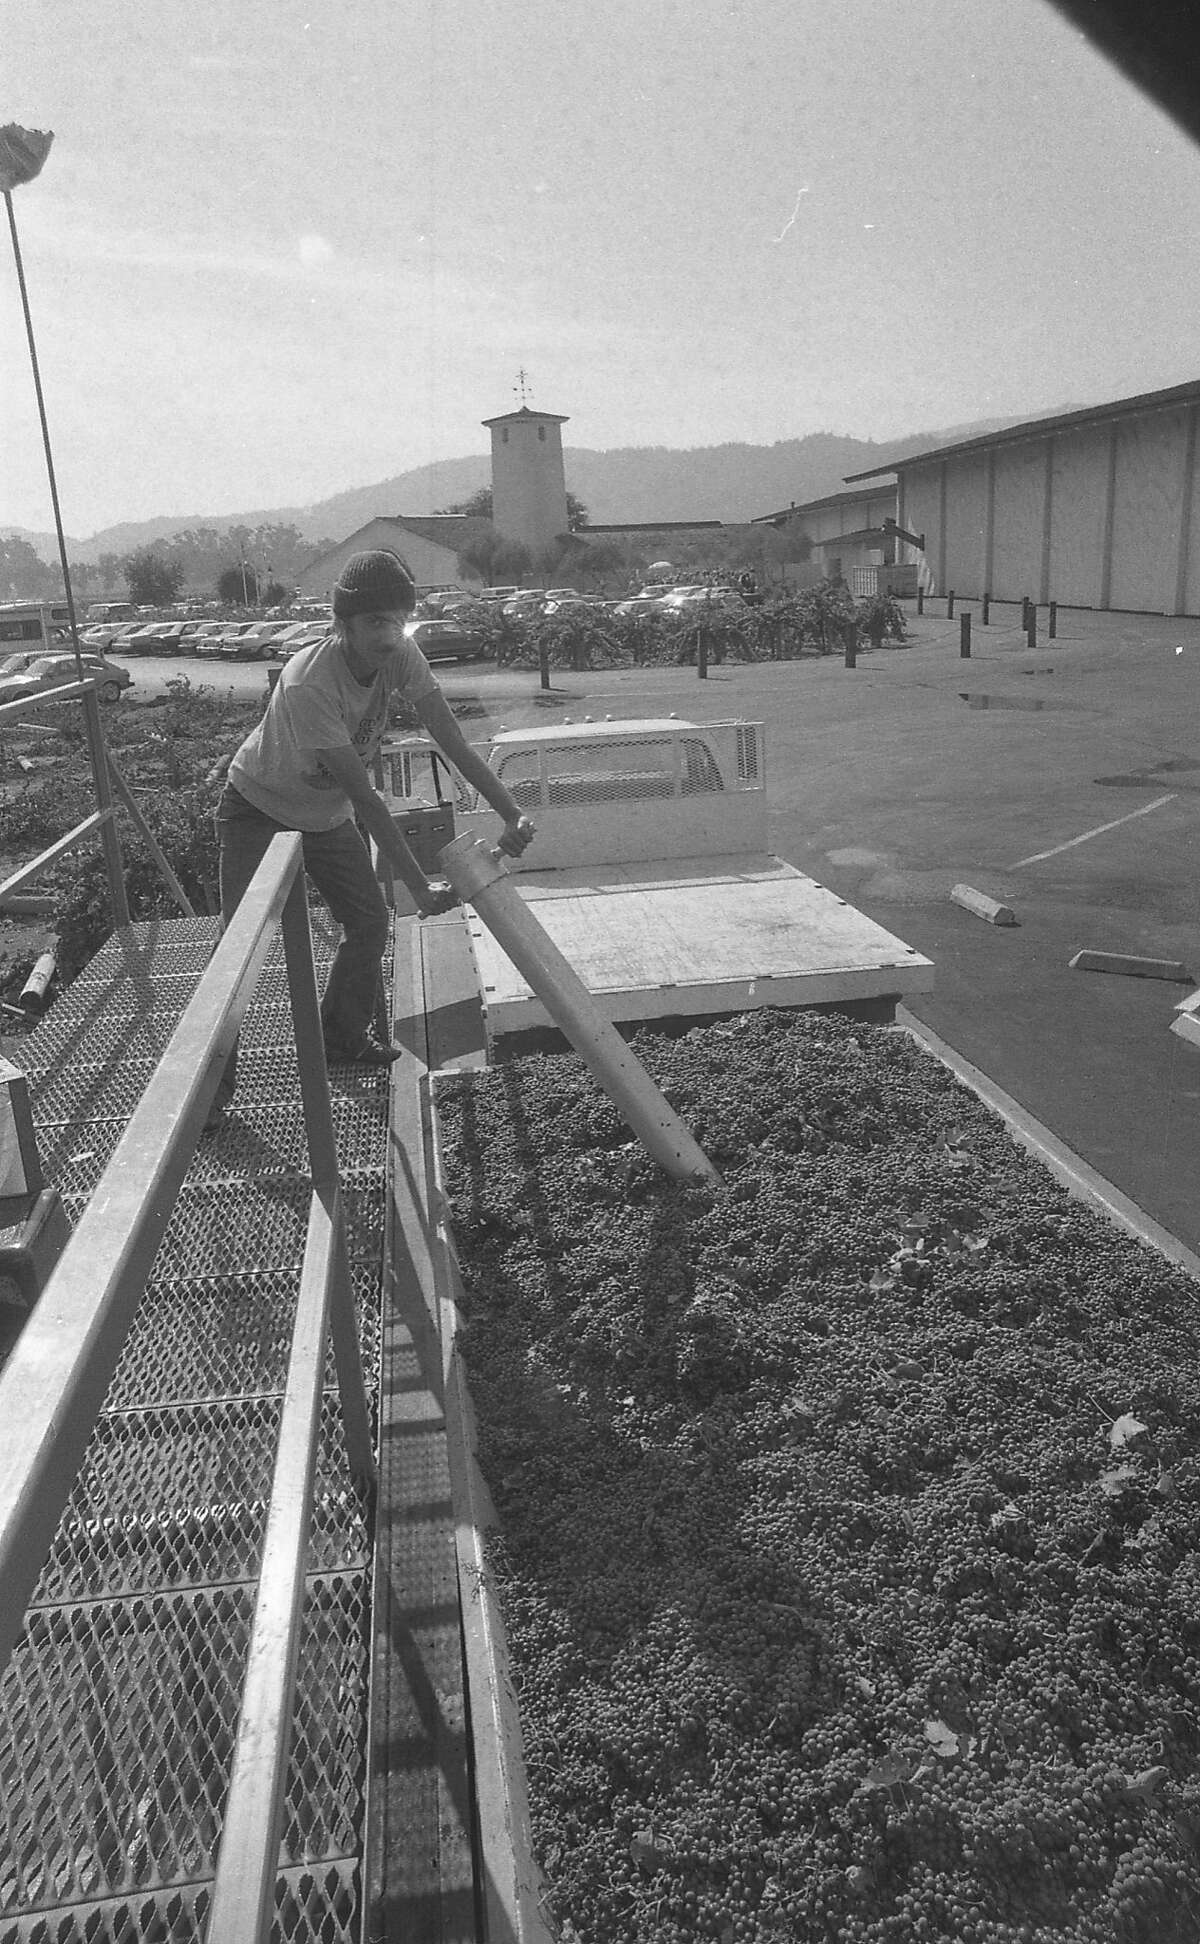 Grape Harvest, Mondavi Winery, Rutherford, Napa County Filed April 18, 1981